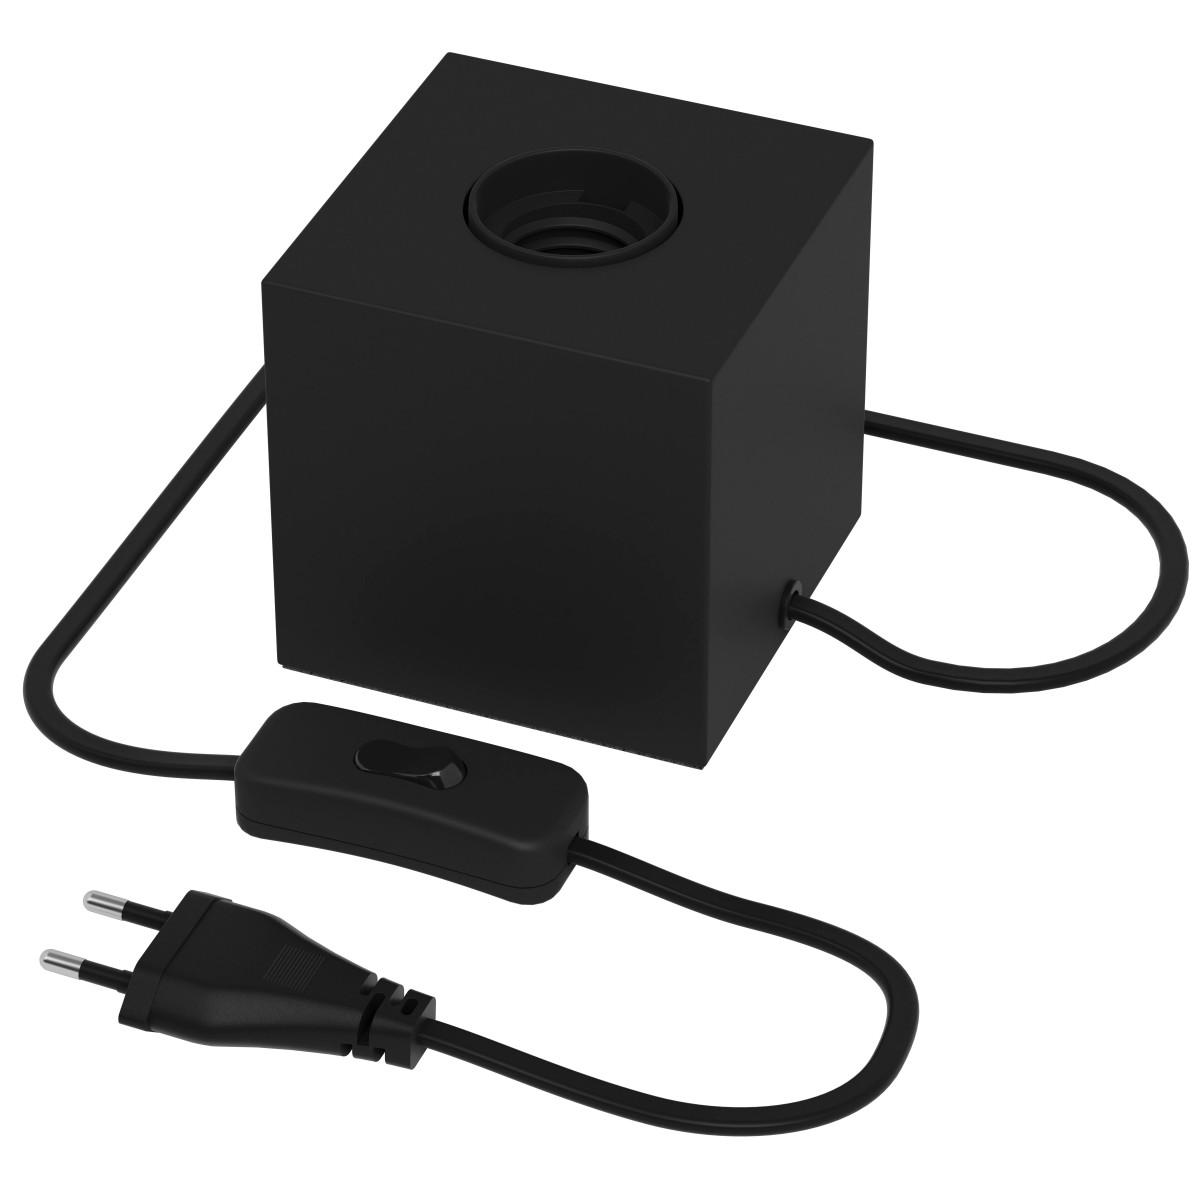 Tafellamp Zwart met e27 fitting